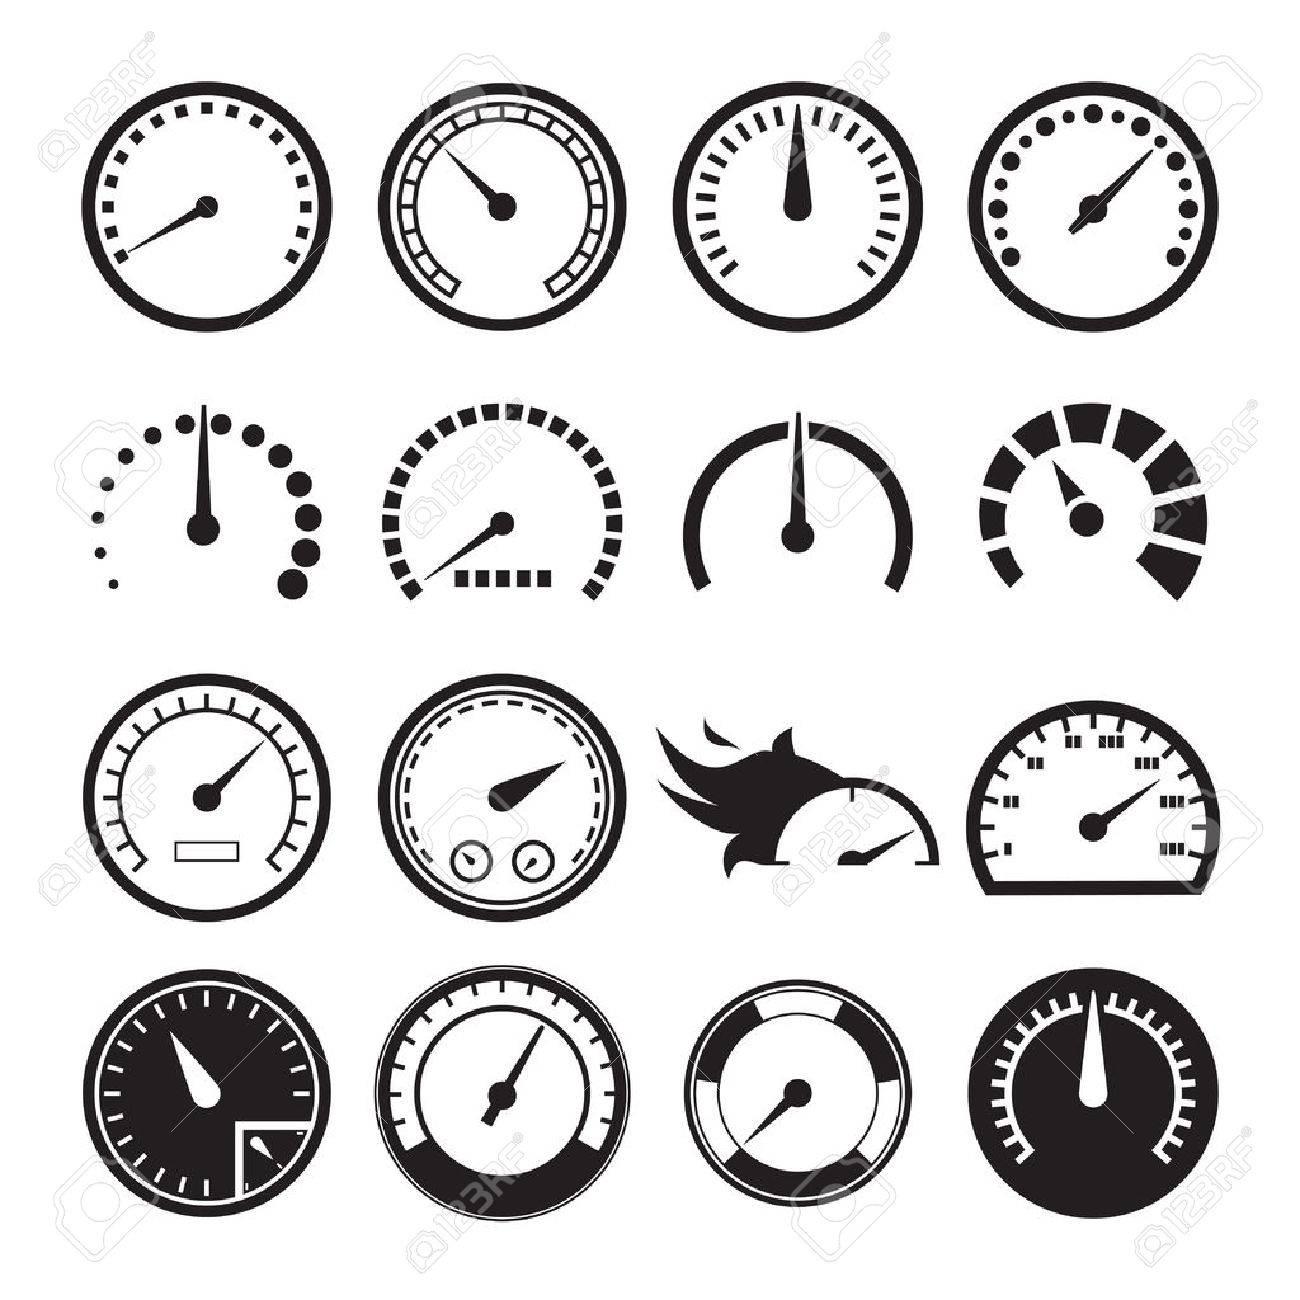 Set of speedometers icons. Vector illustration - 55118968